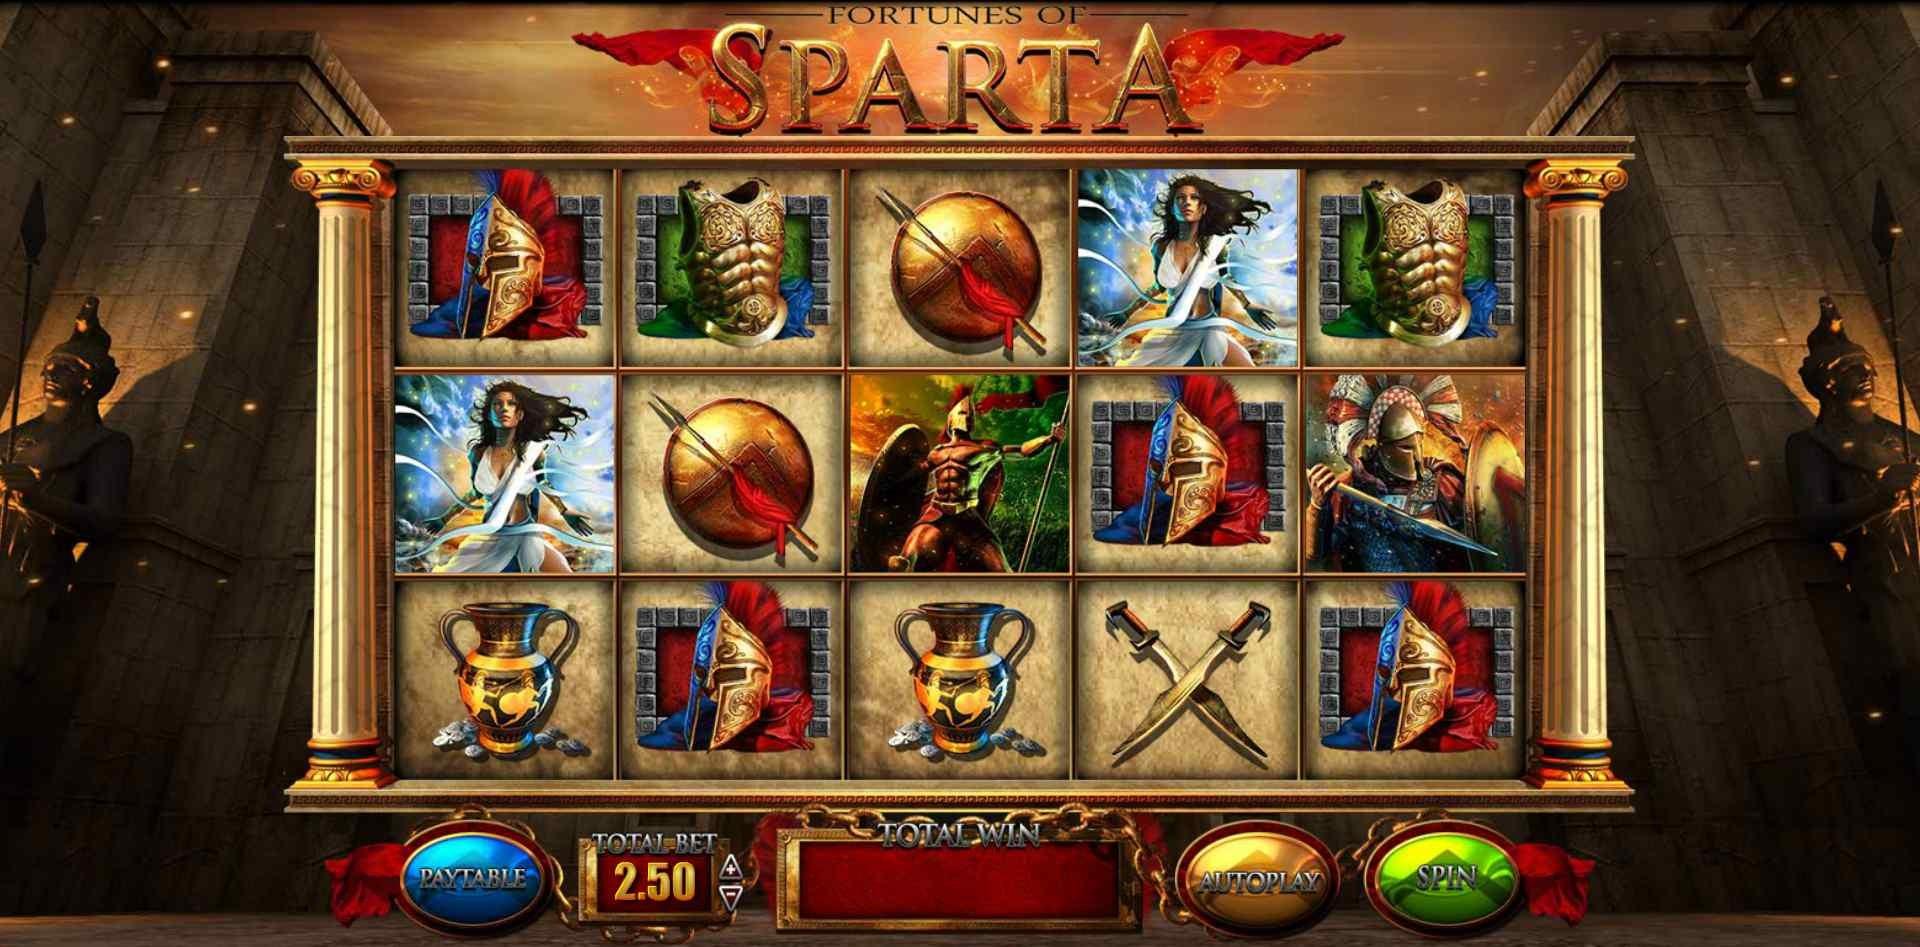 Spartan Streak feature in Blueprint's Fortunes of Sparta online slot